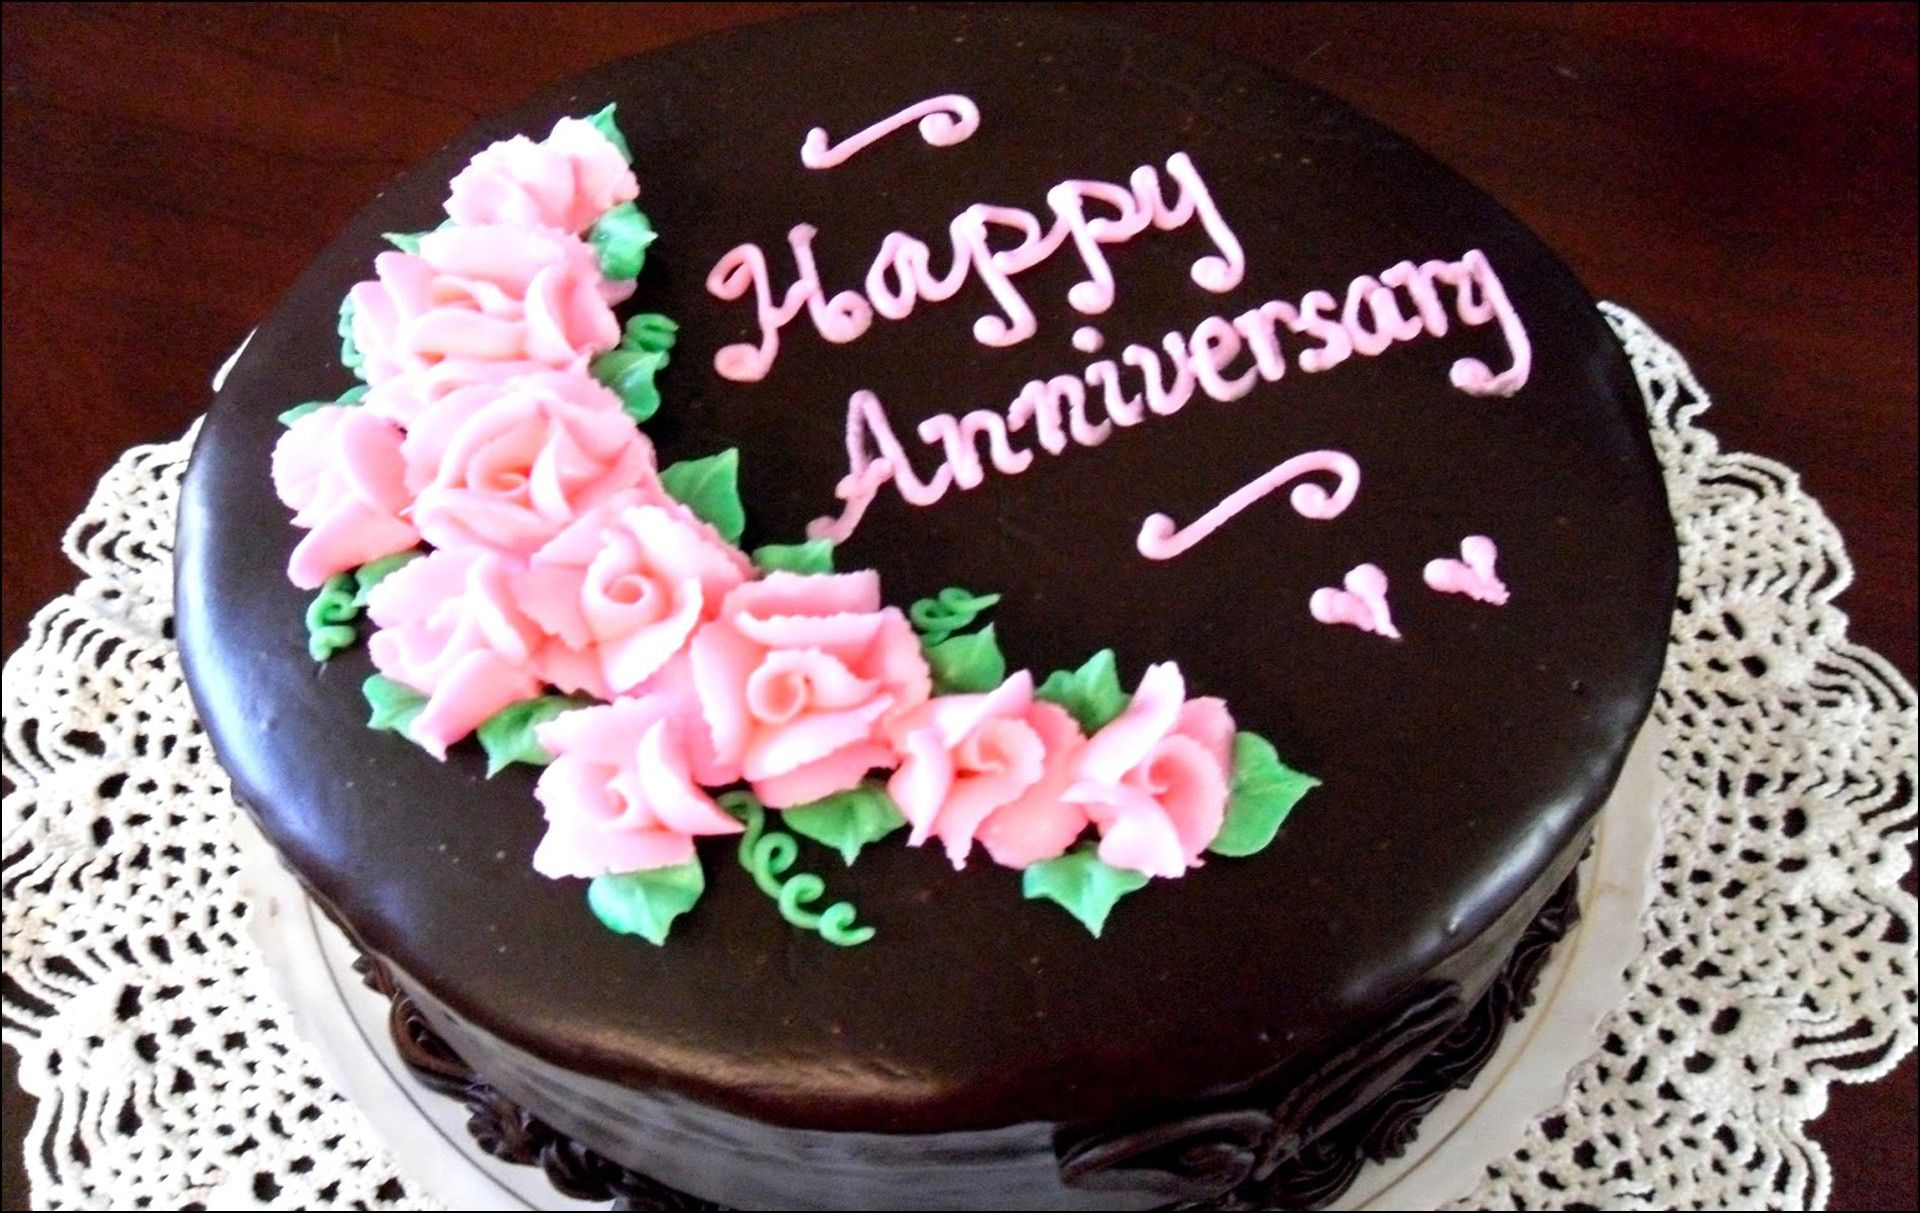 Wedding anniversary cake quotes b pinterest wedding